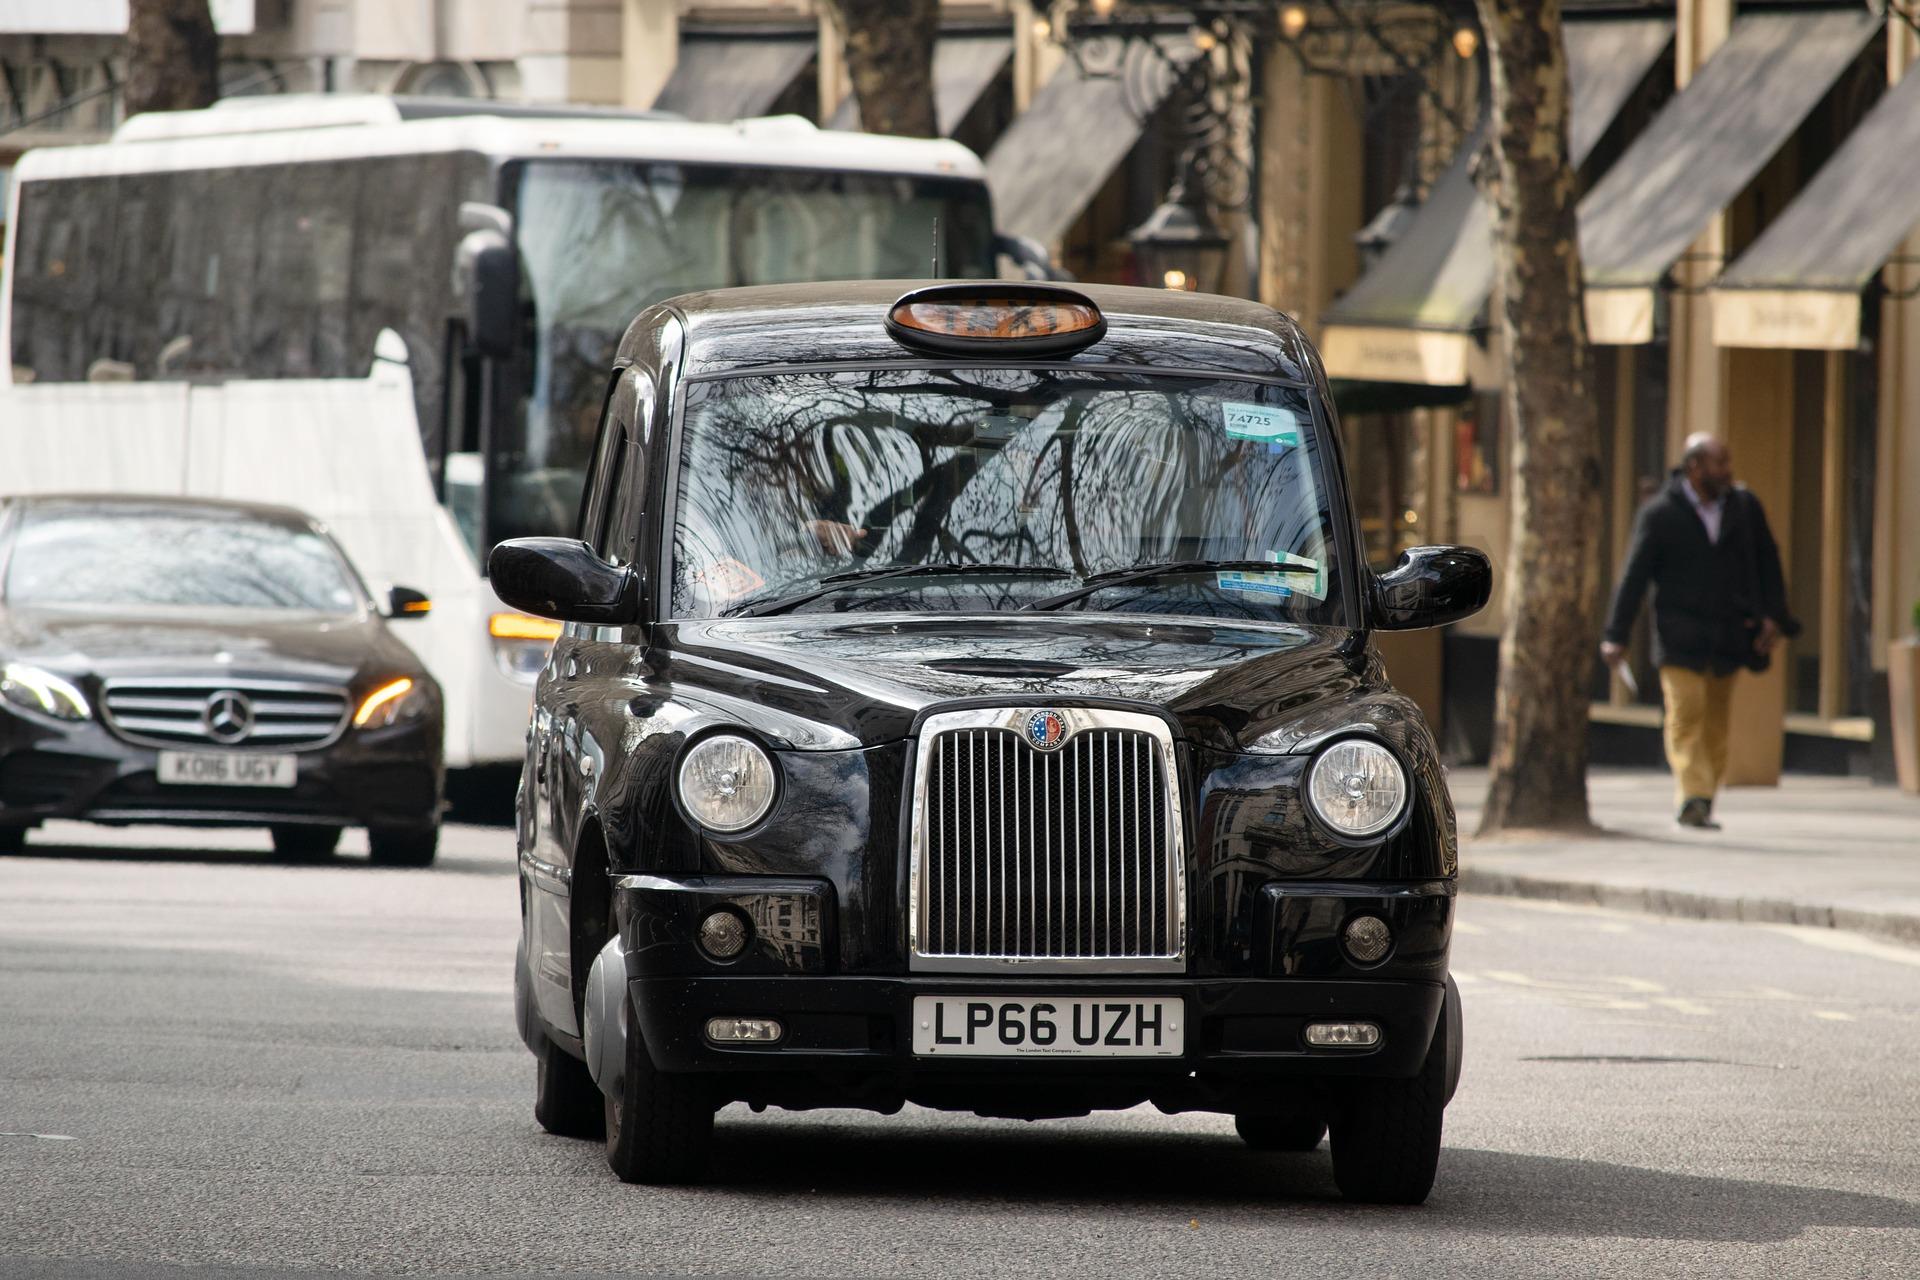 London black cab exempt from ULEZ